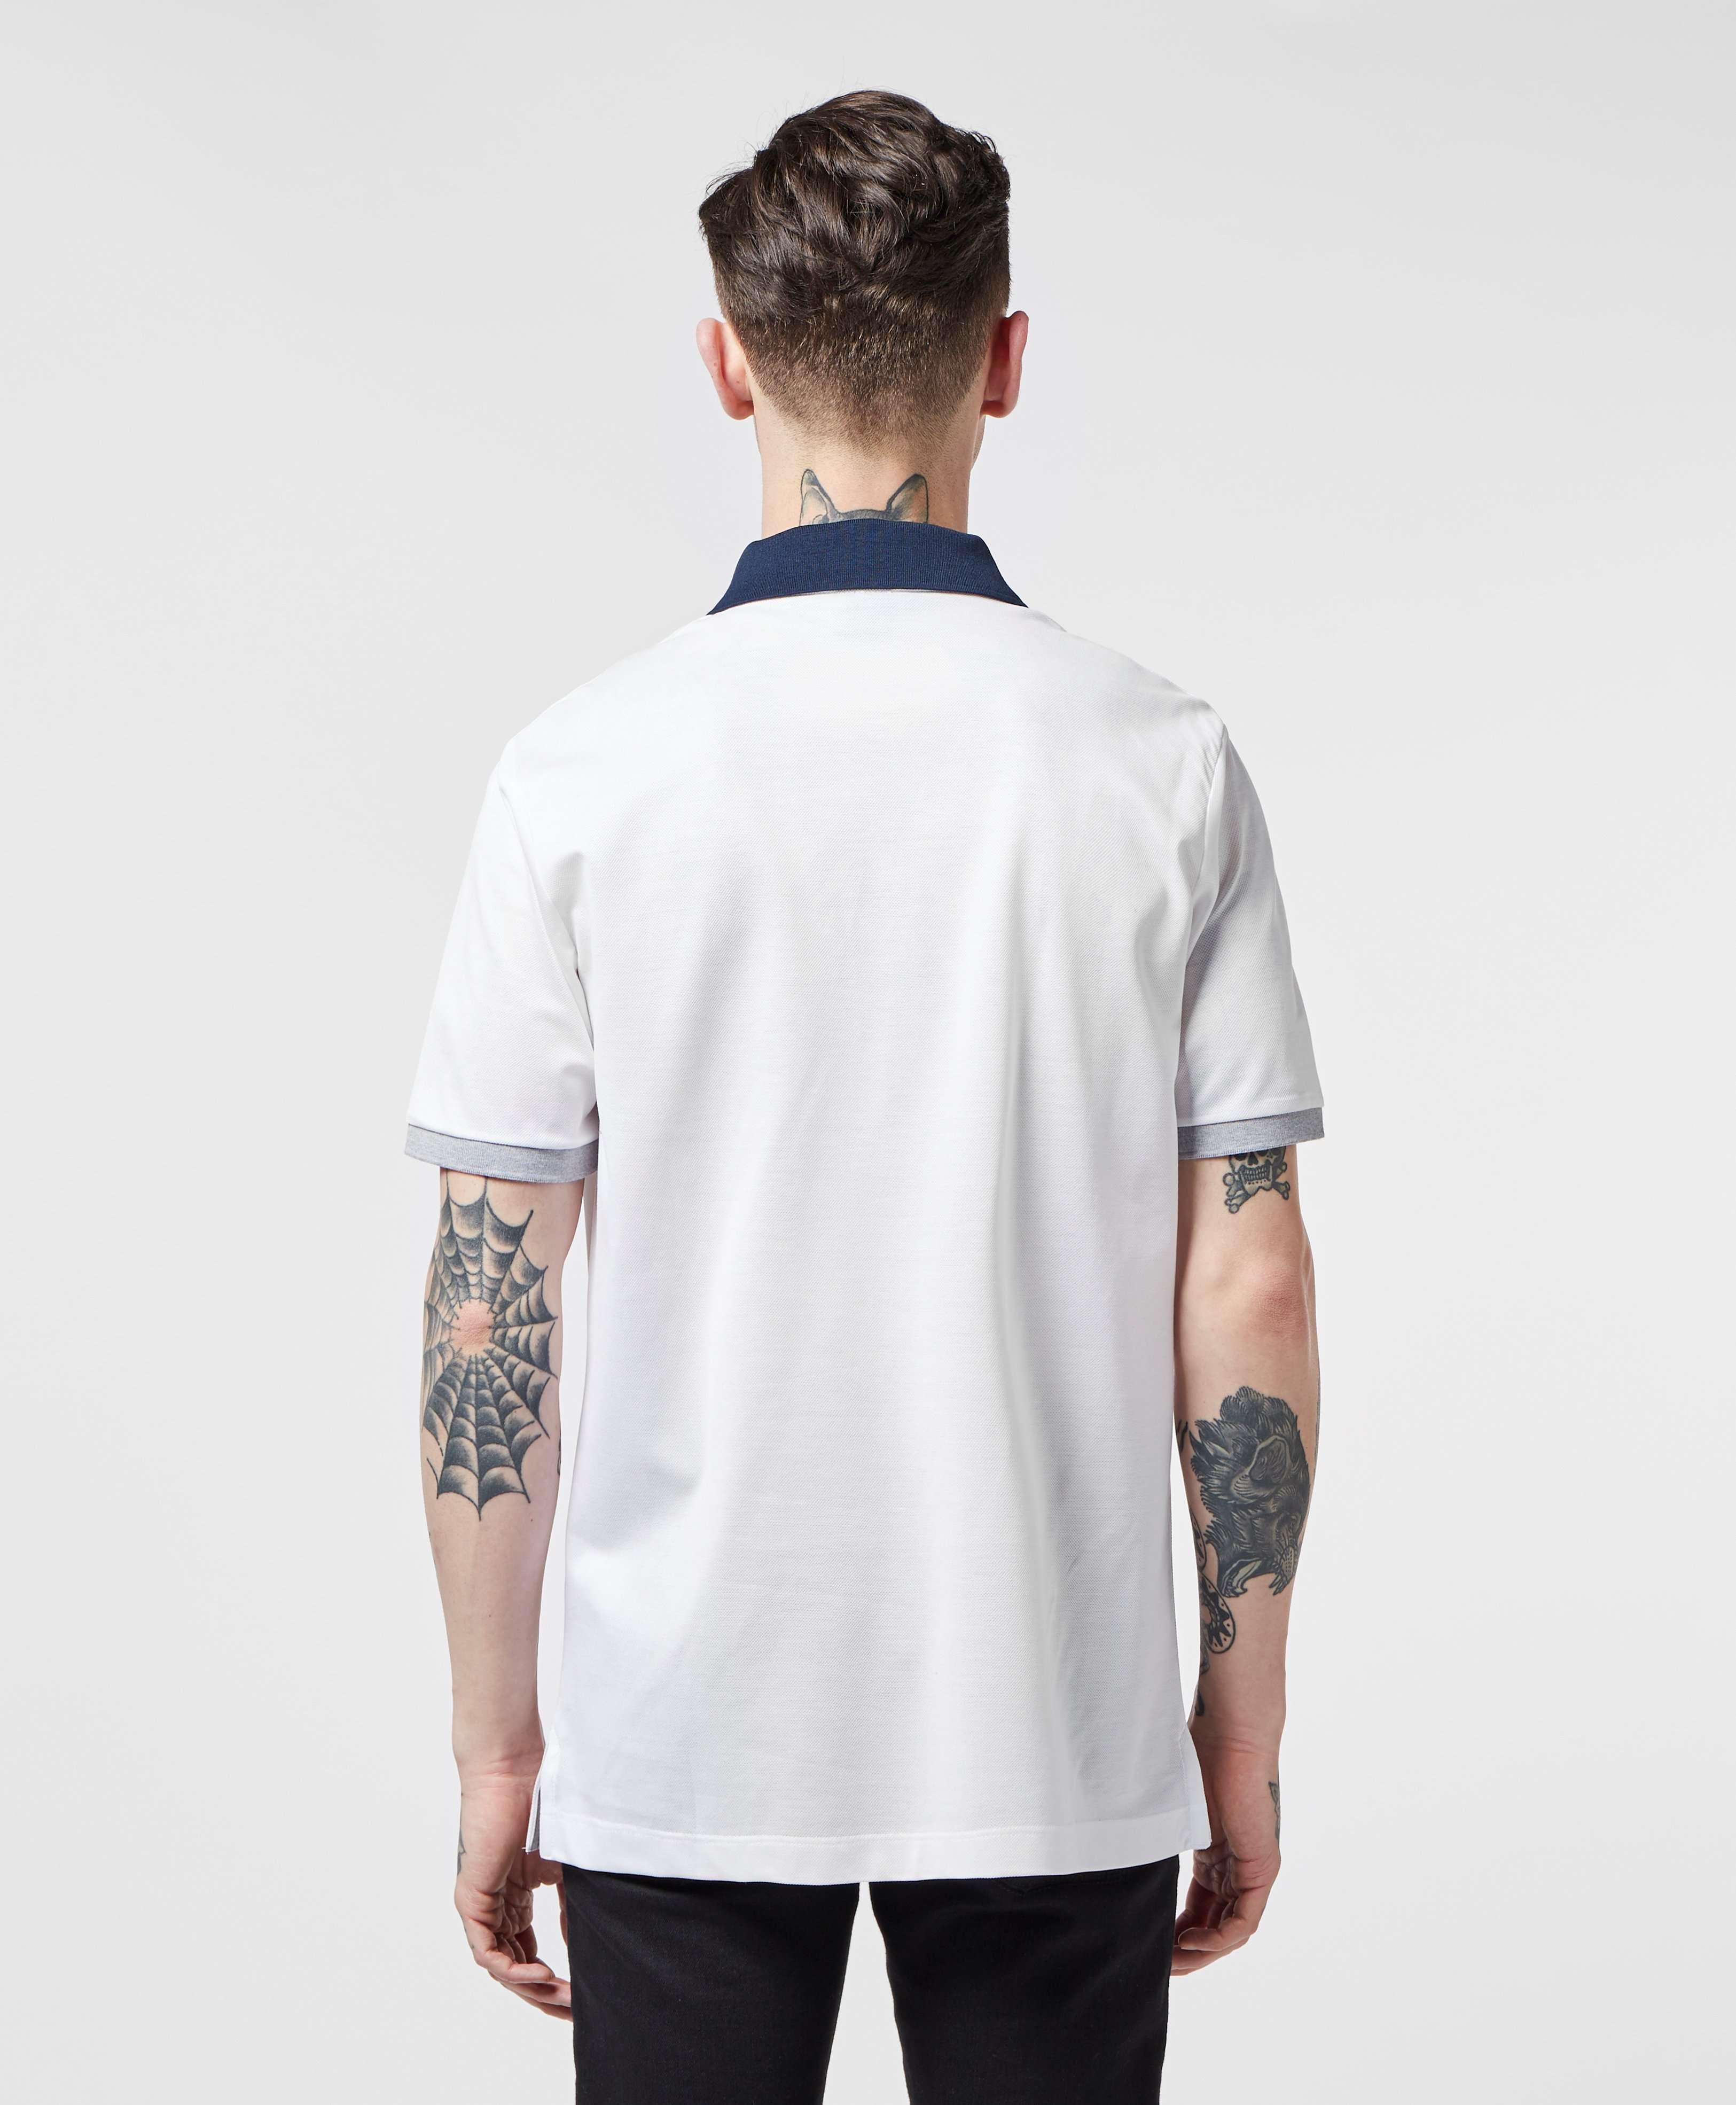 Paul and Shark Premium Contrast Collar Short Sleeve Polo Shirt